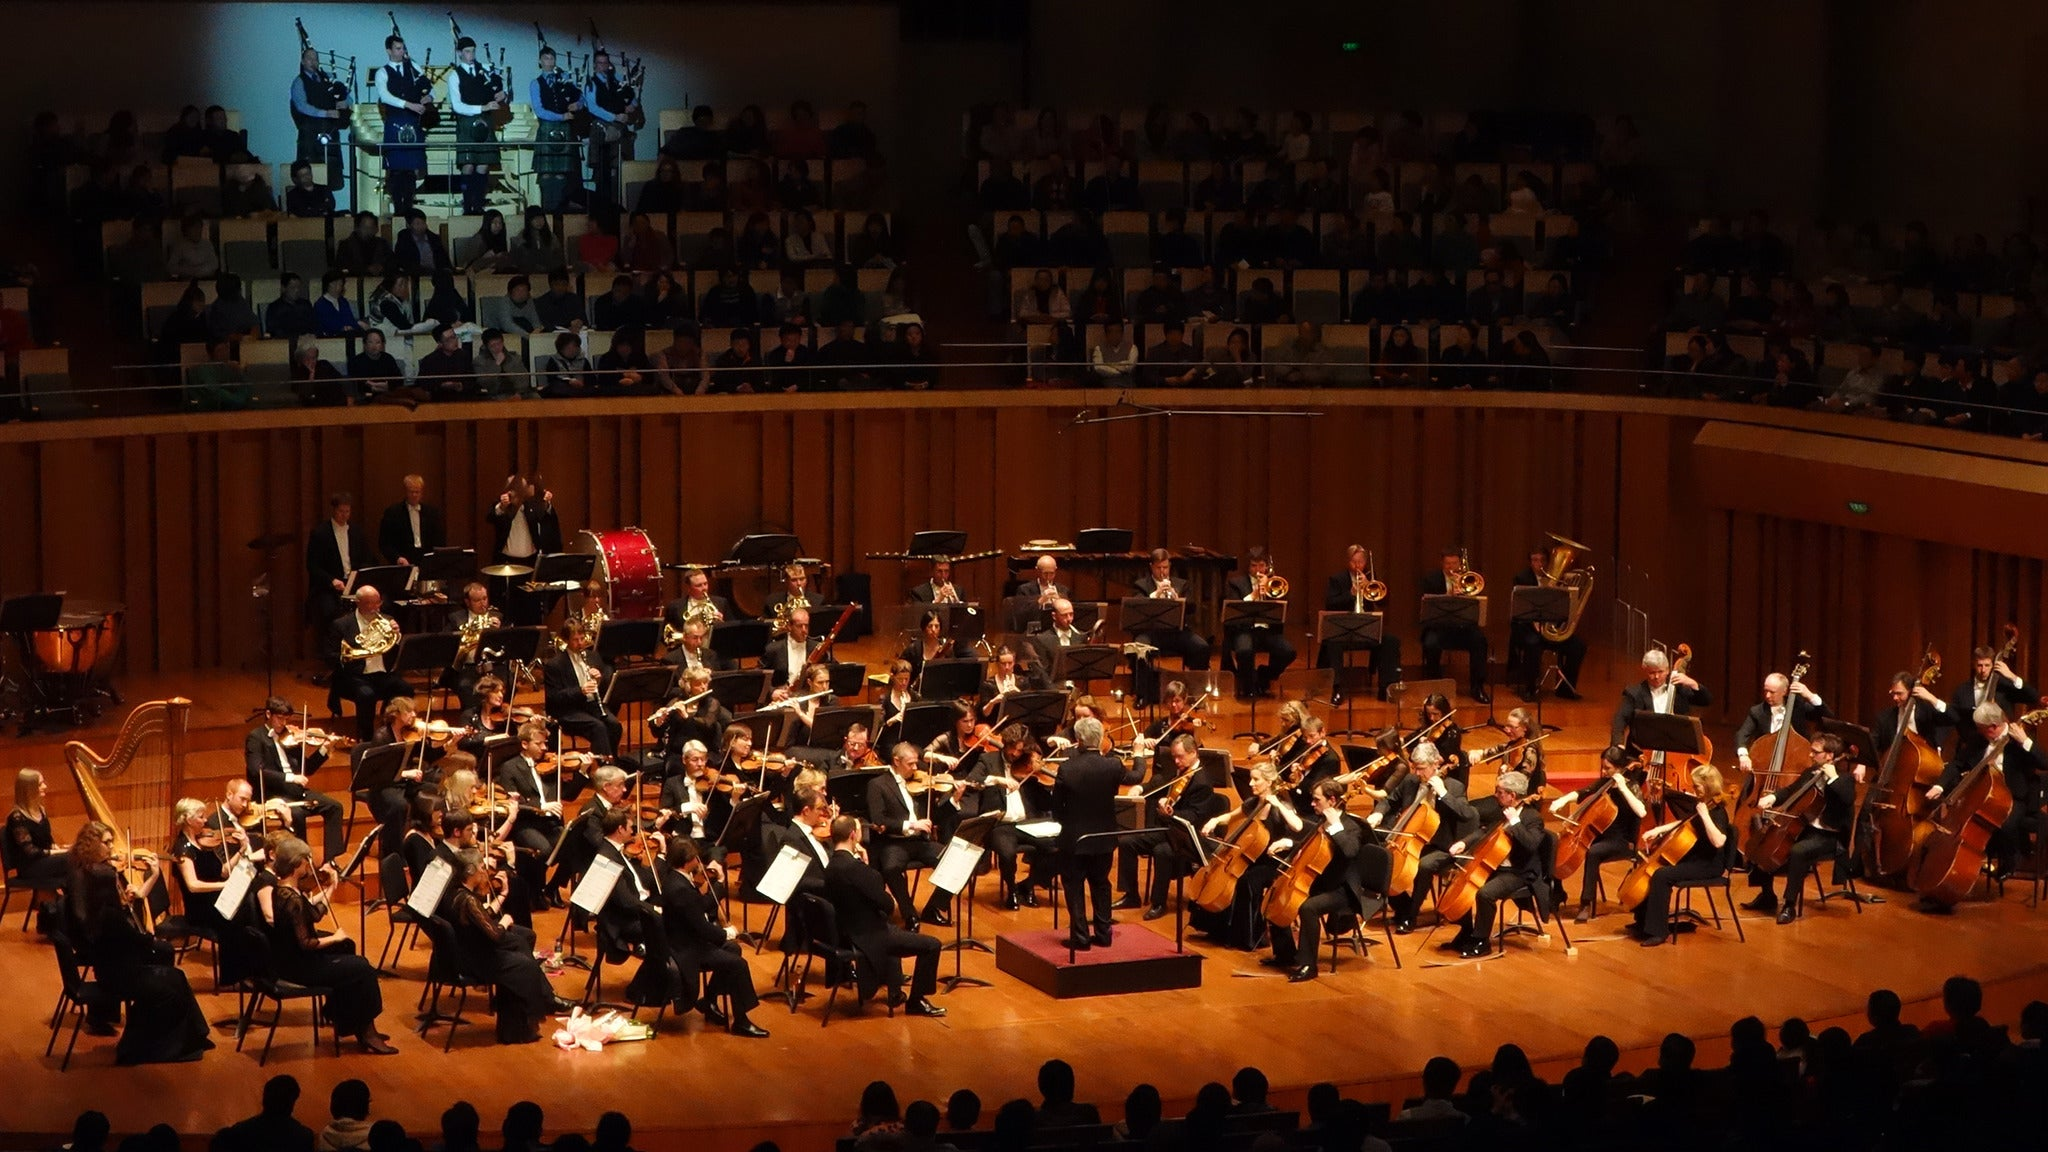 Royal Scottish National Orchestra - Ft Lauderdale, FL 33312